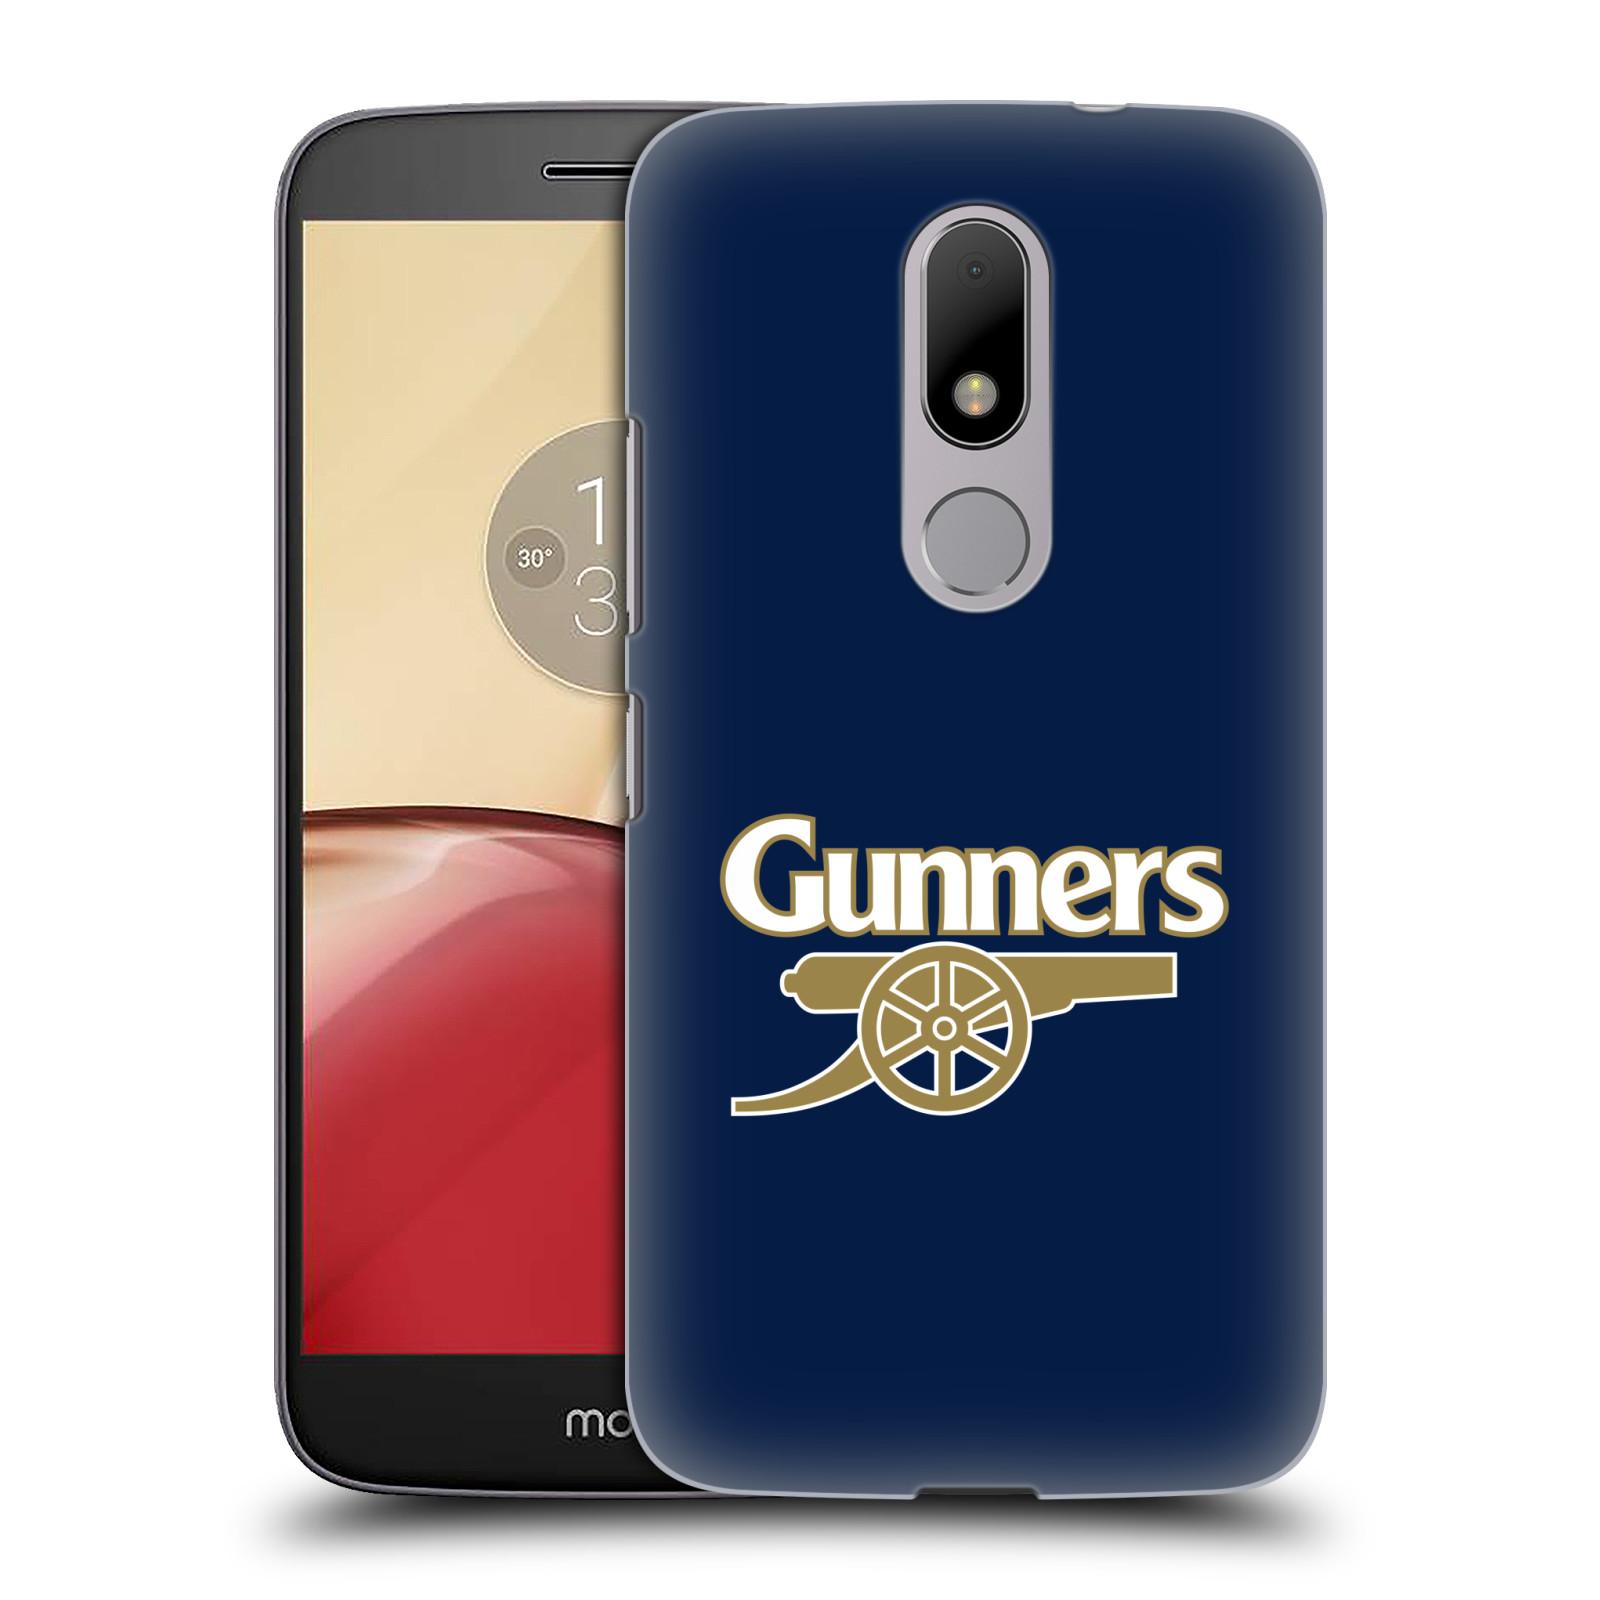 Plastové pouzdro na mobil Lenovo Moto M - Head Case - Arsenal FC - Gunners